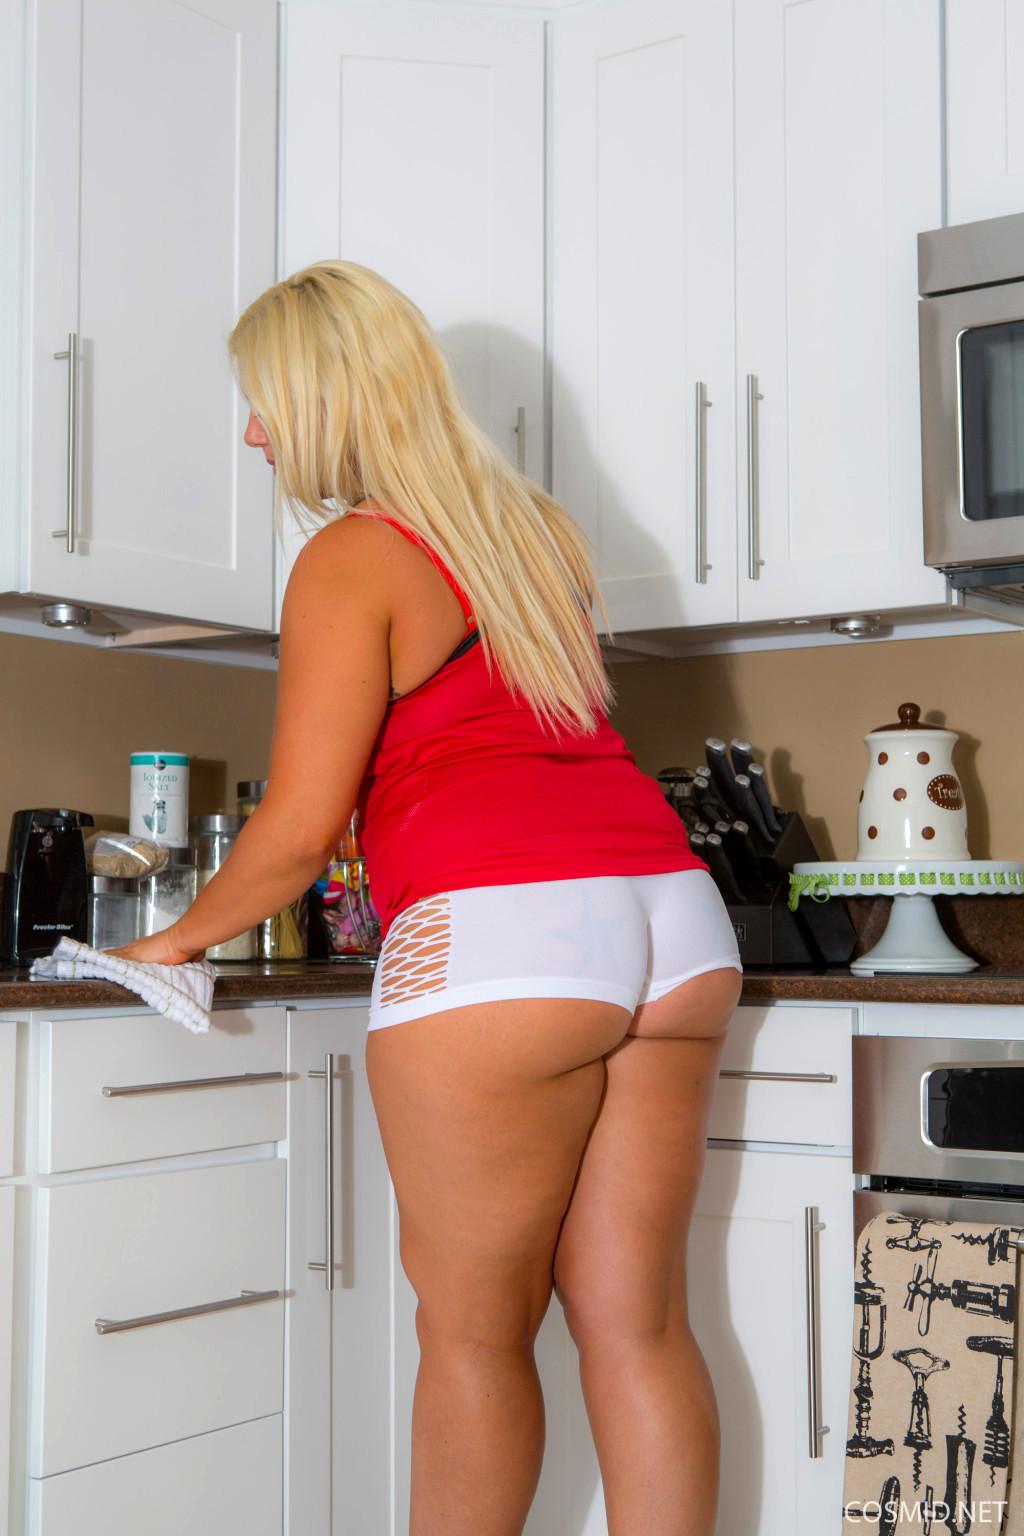 Amanda Clark Porn cosmid amanda clark xxxsmokers large ass vipsex porn pics